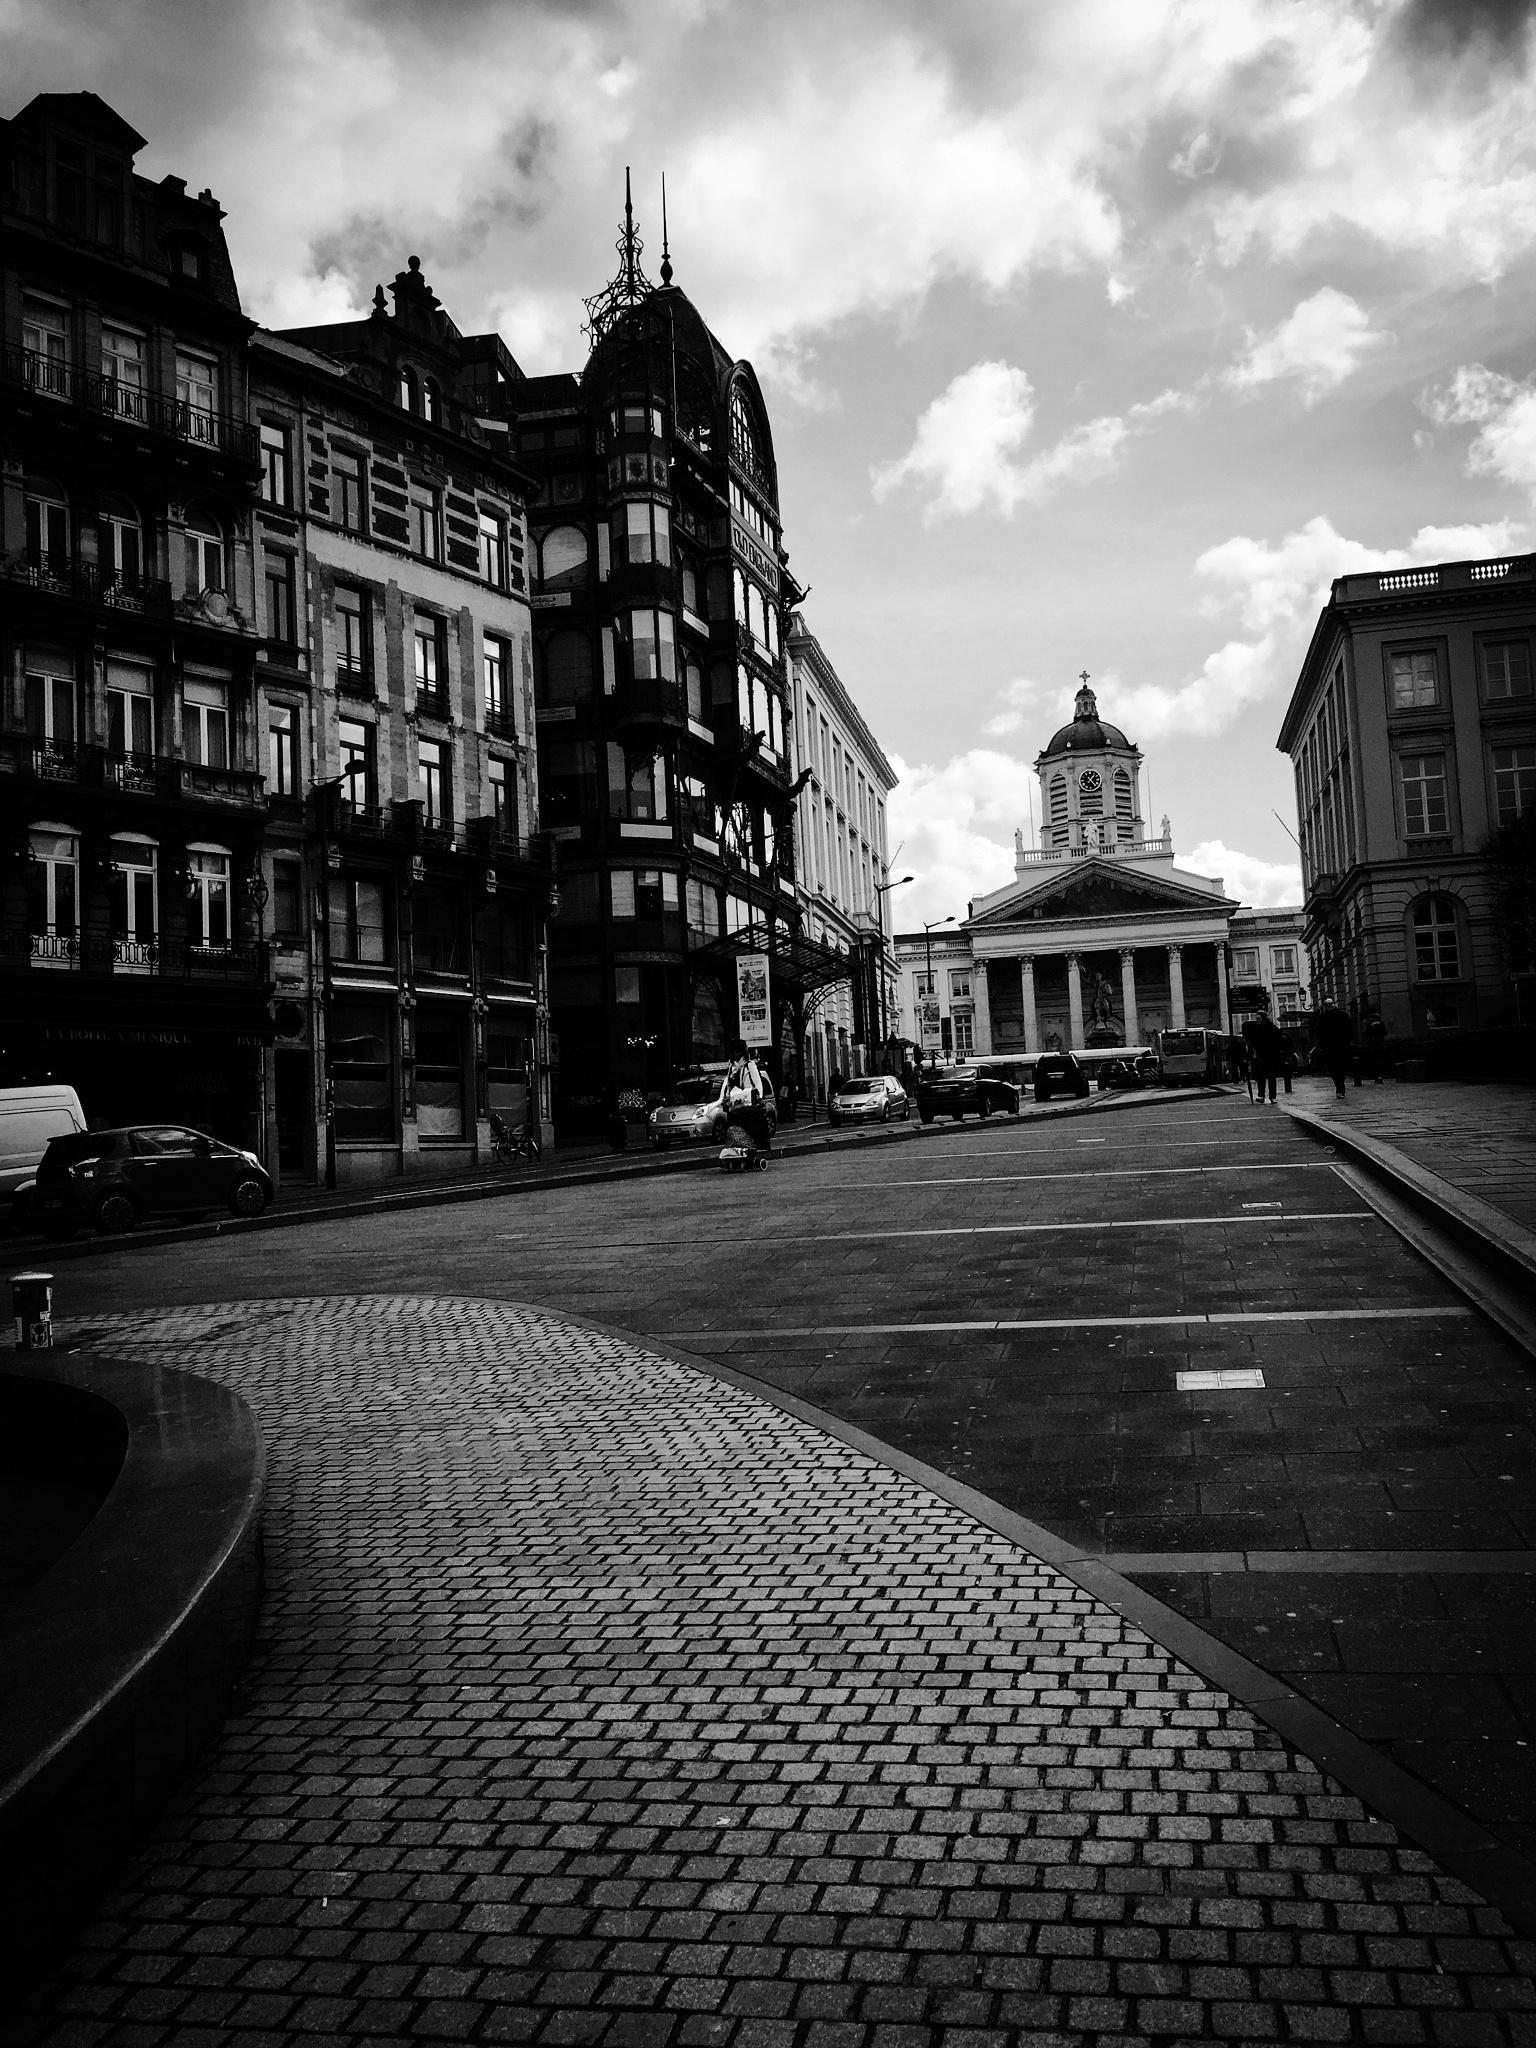 City life by IvonaPriest